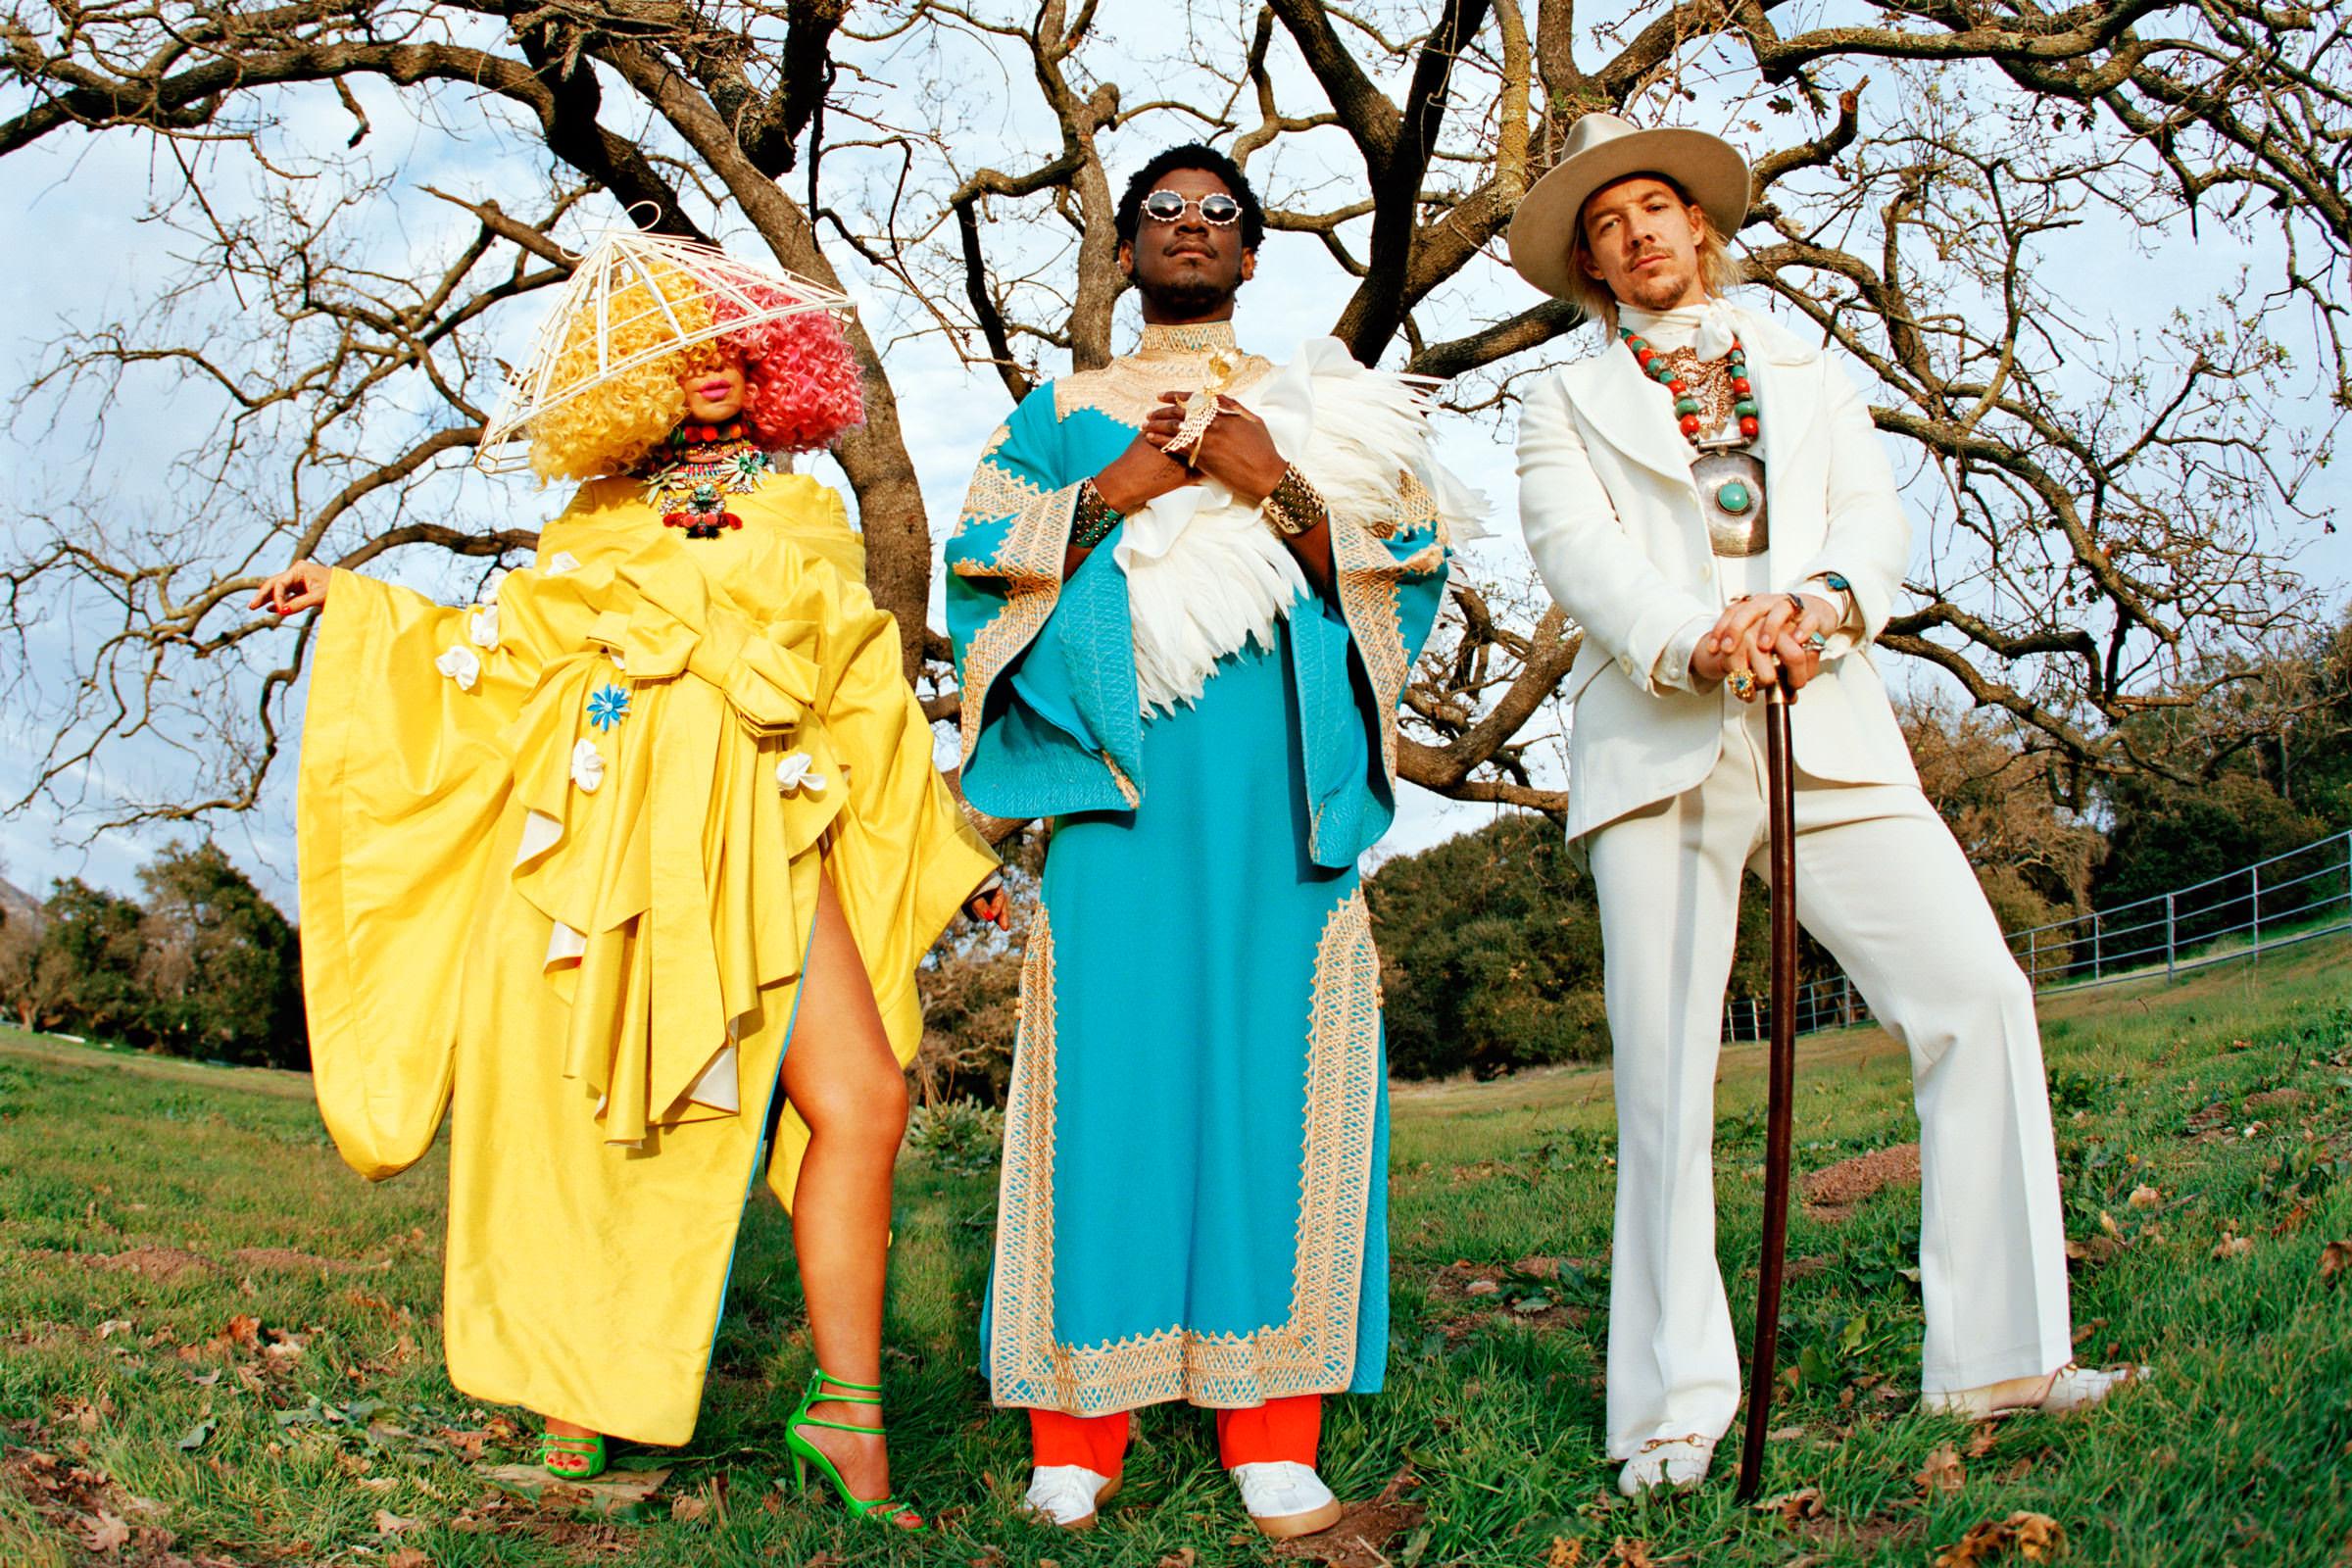 Labrinth, Sia, Diplo presents LSD